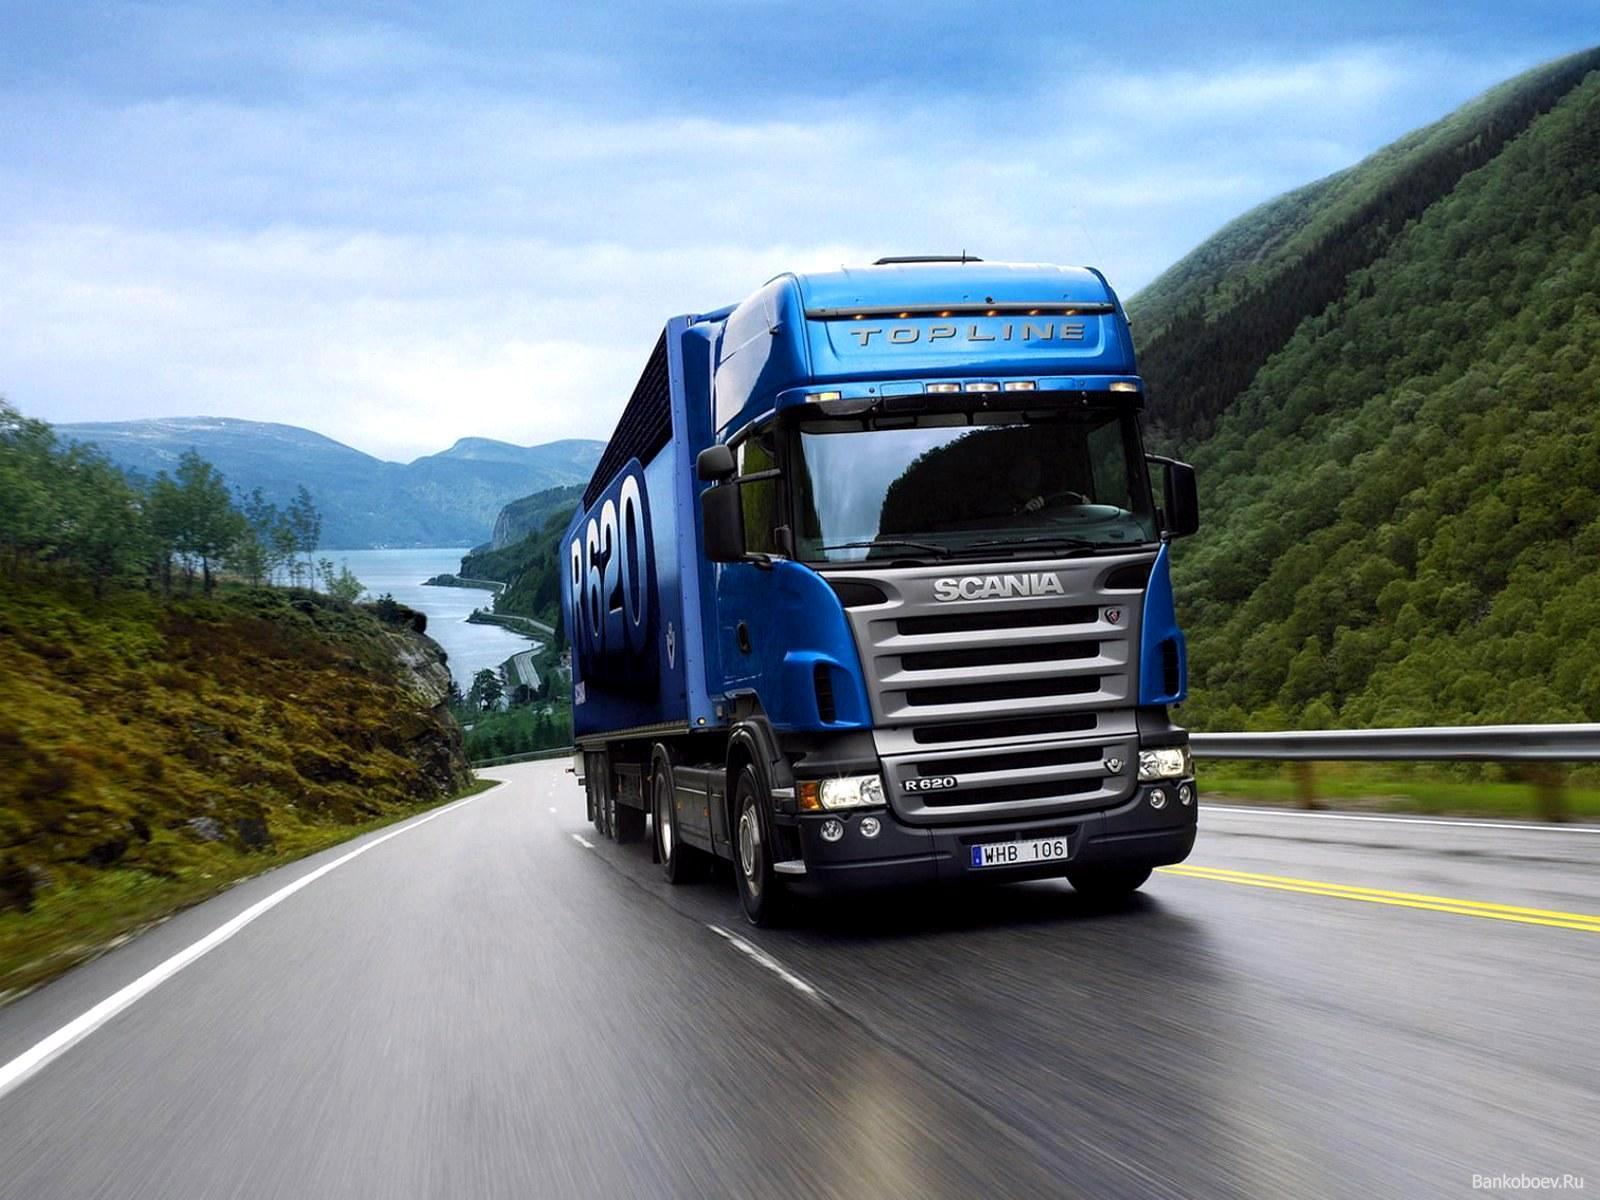 Scania Trucks Wallpapers Wallpaper